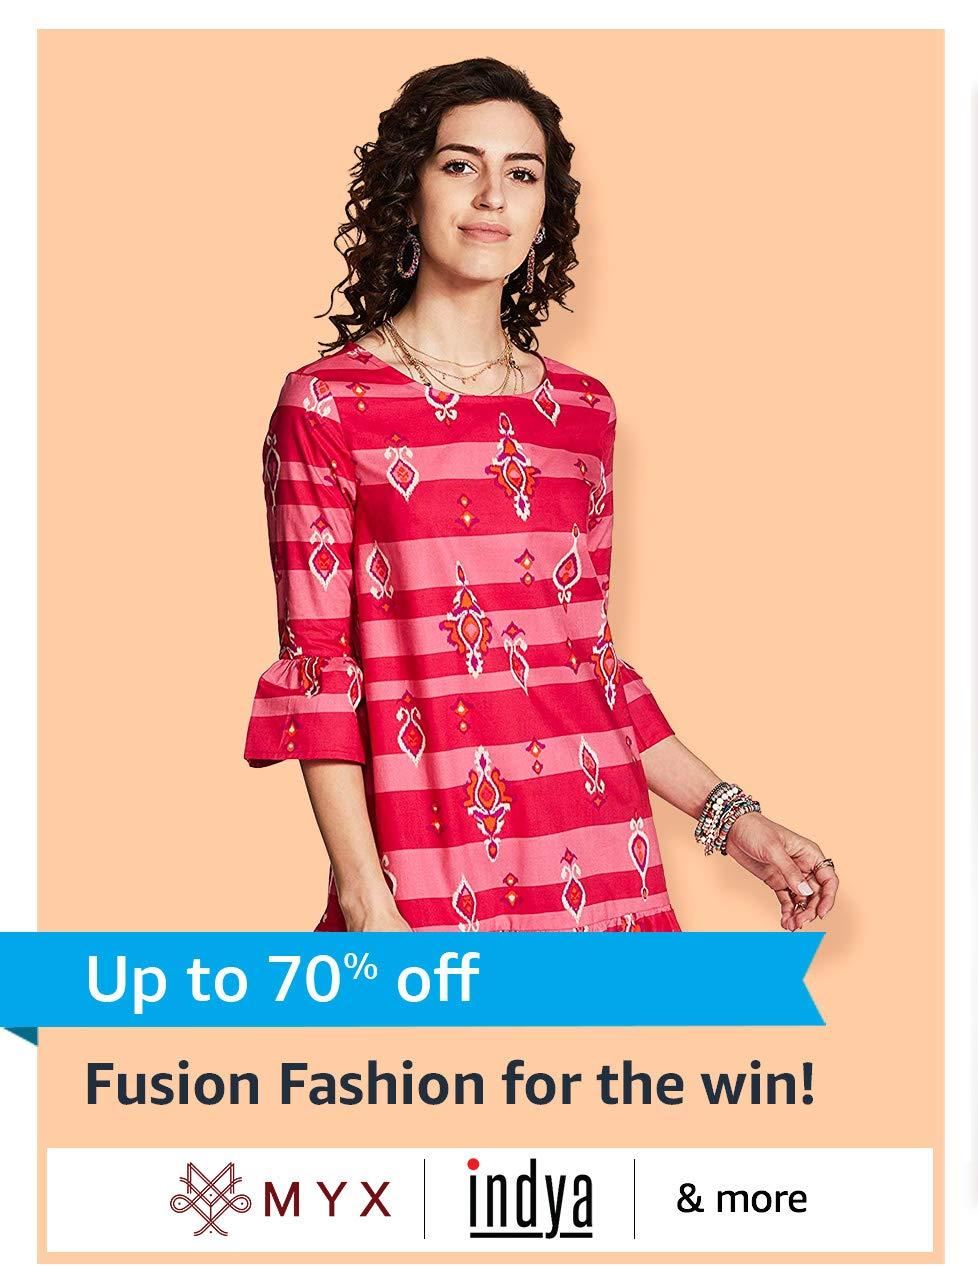 Fusion Fashion for the win!